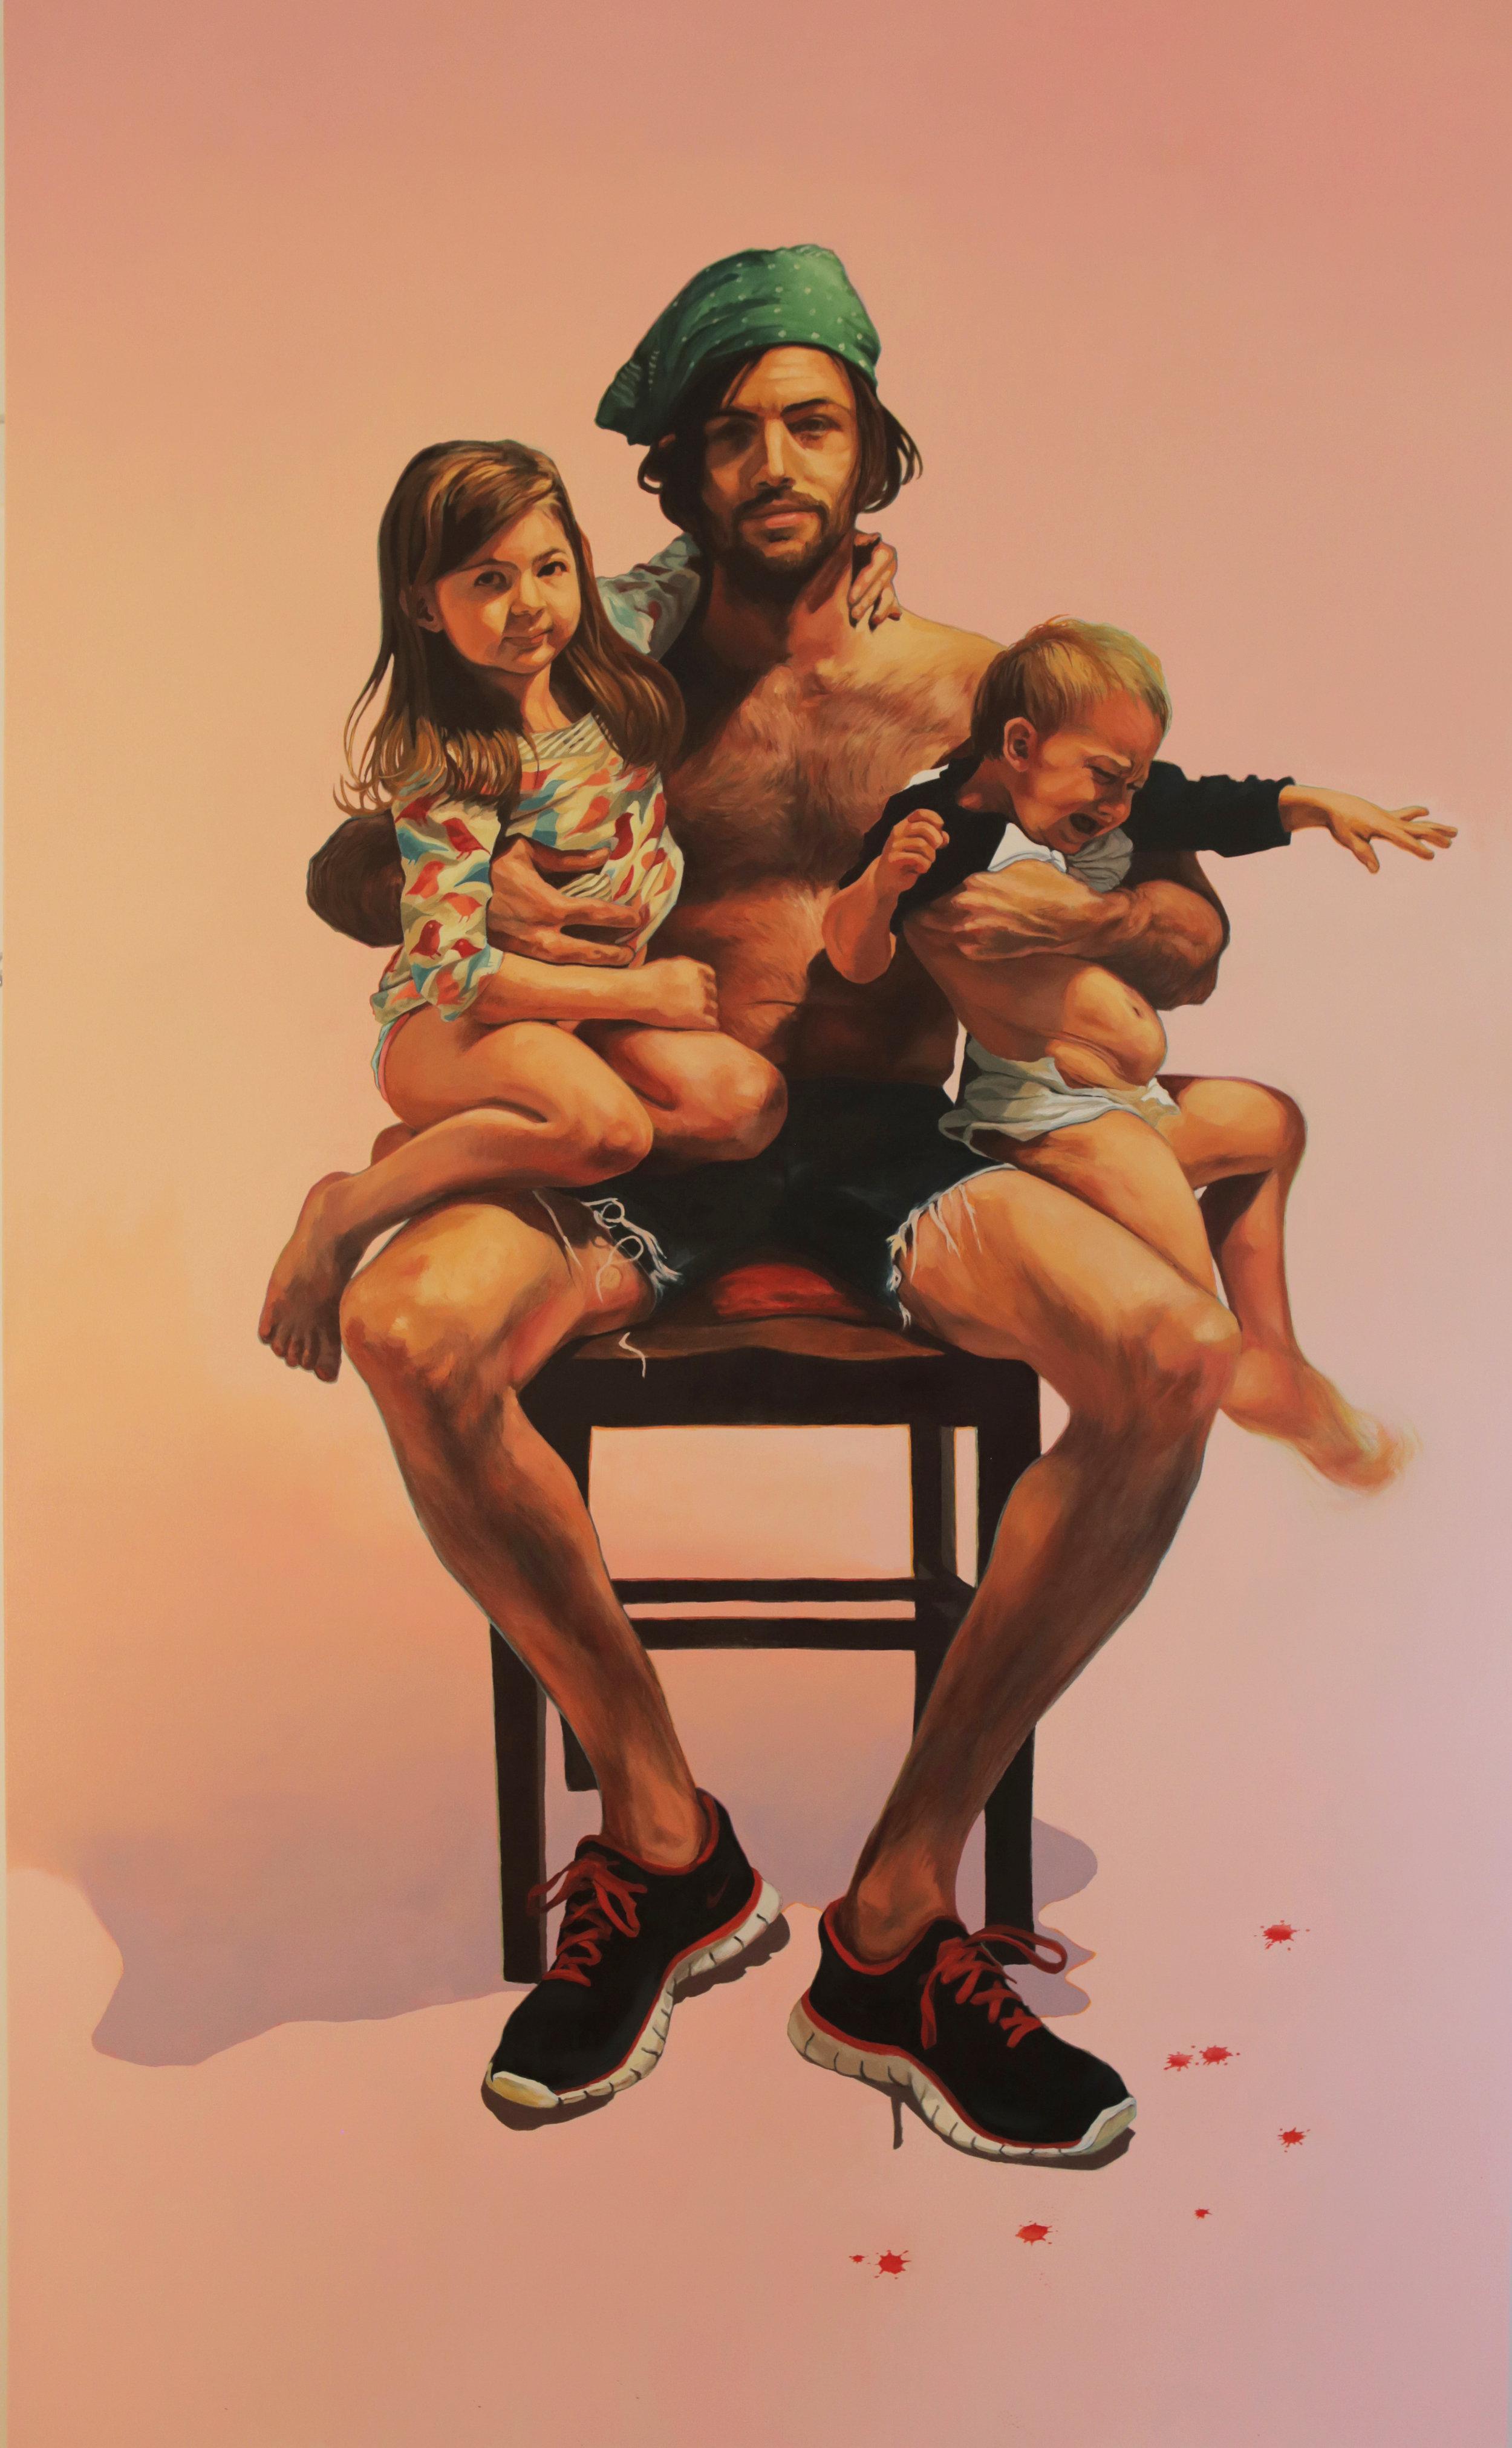 AVETT_Fatherhood_2013_Edited.jpg